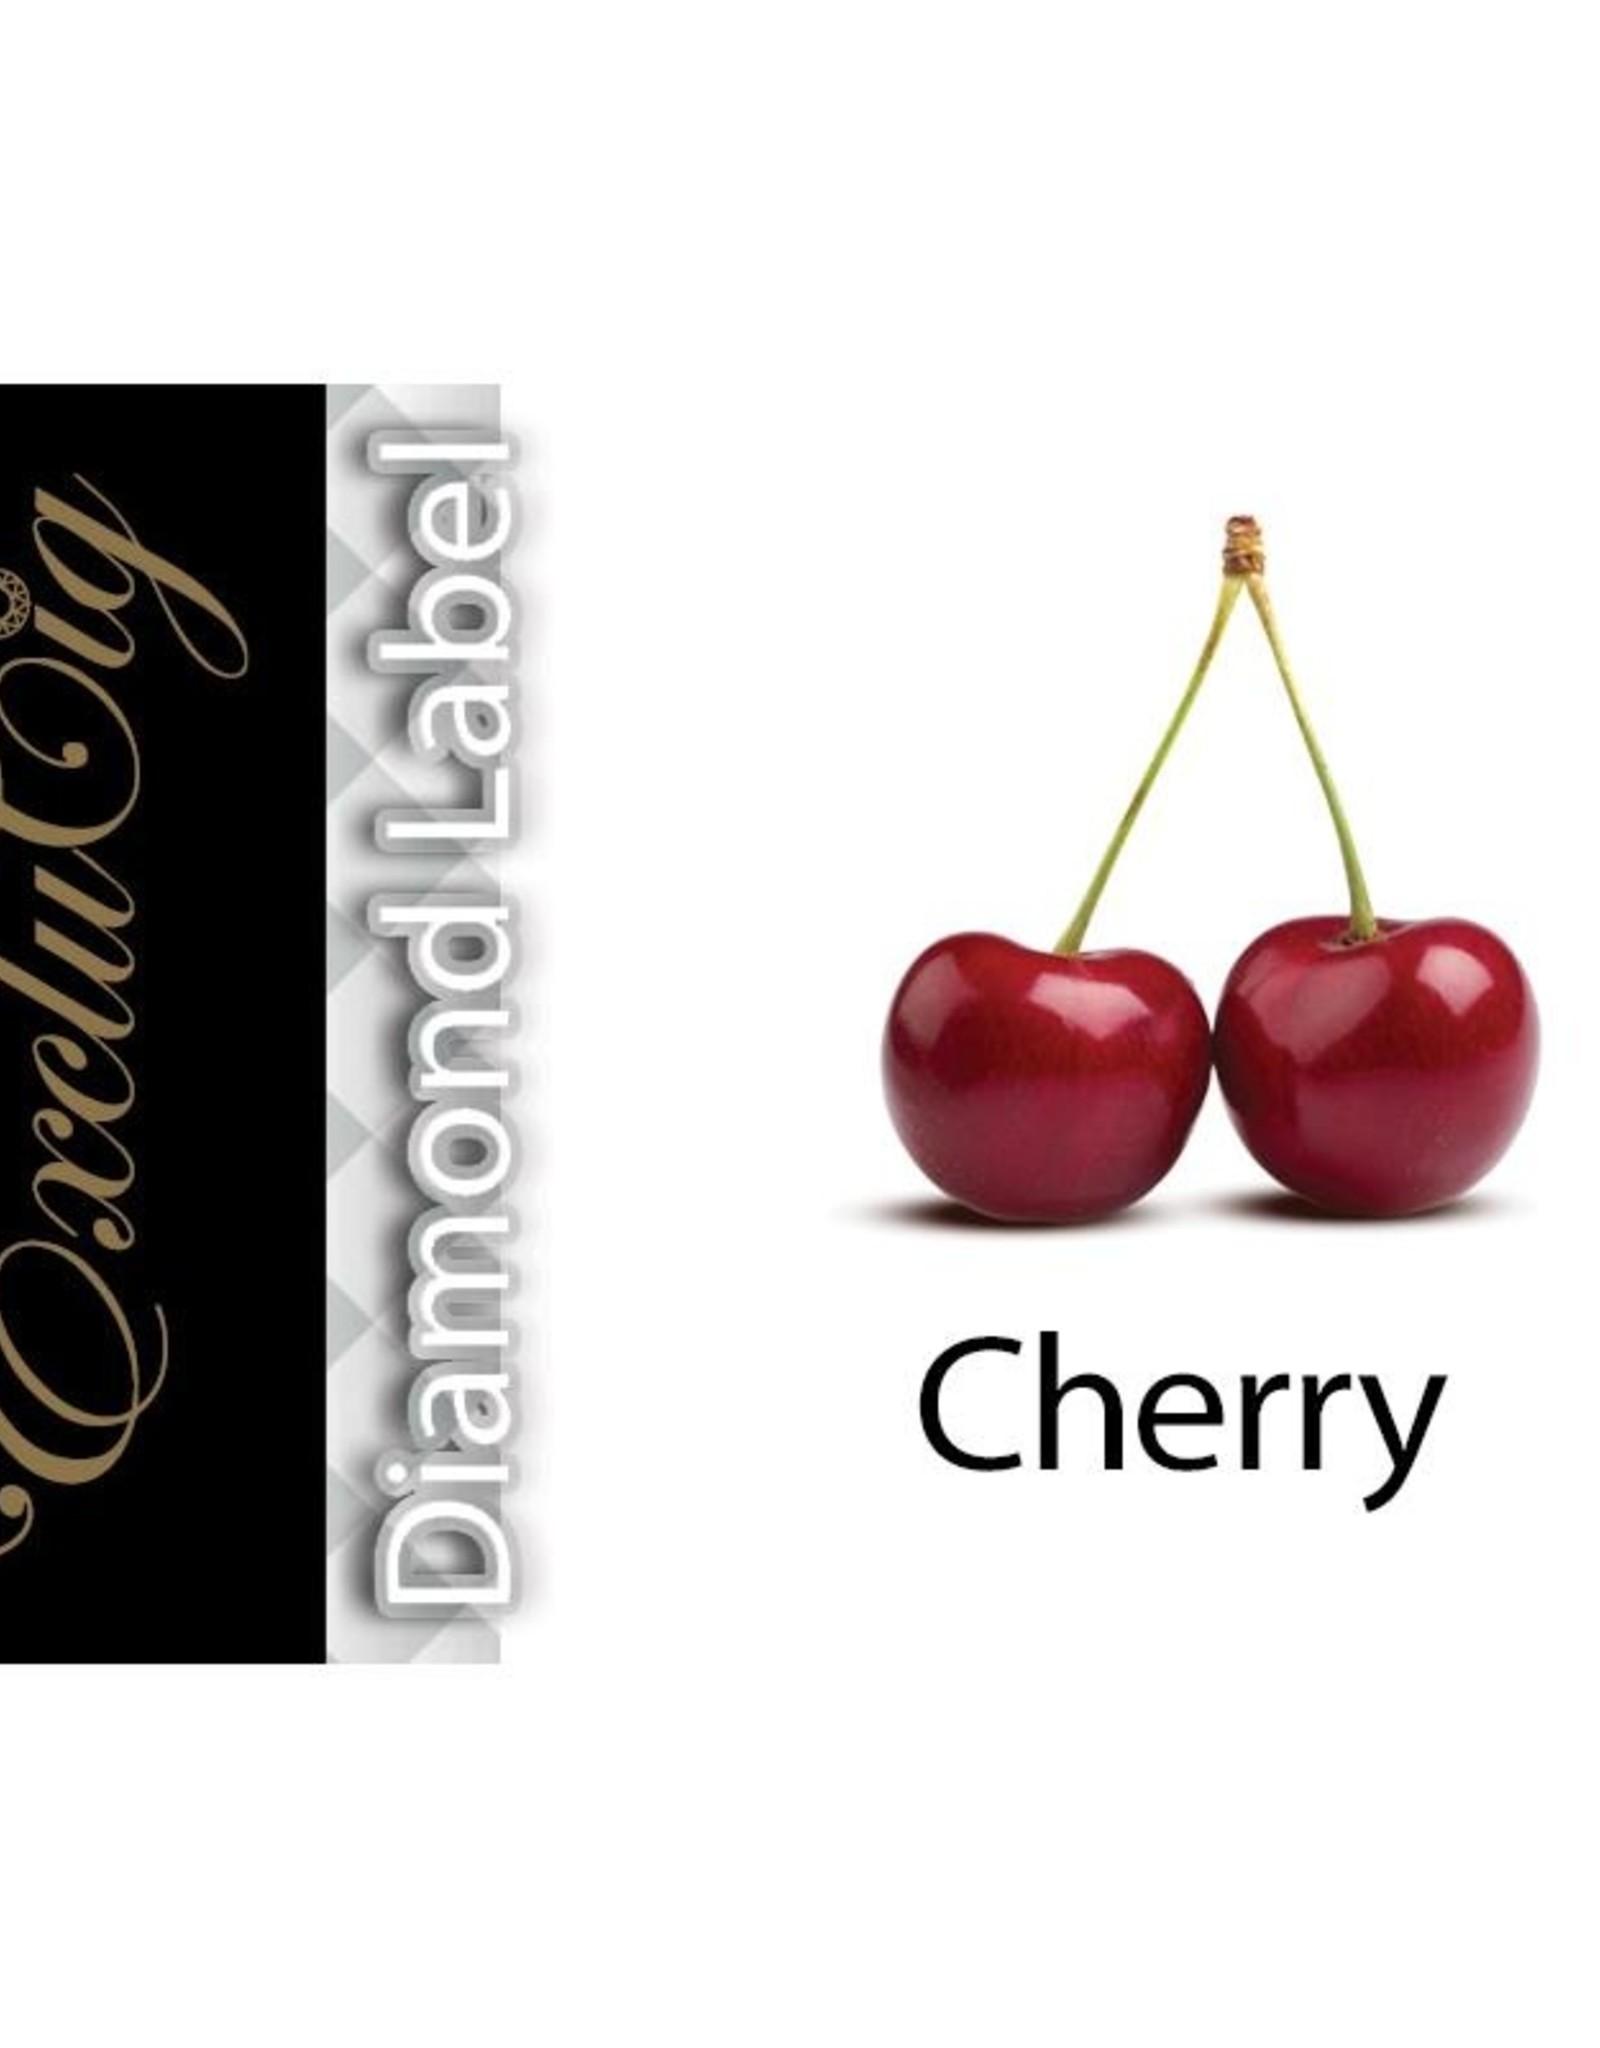 Exclucig Exclucig Diamond Label E-liquid Cherry 0 mg Nicotine